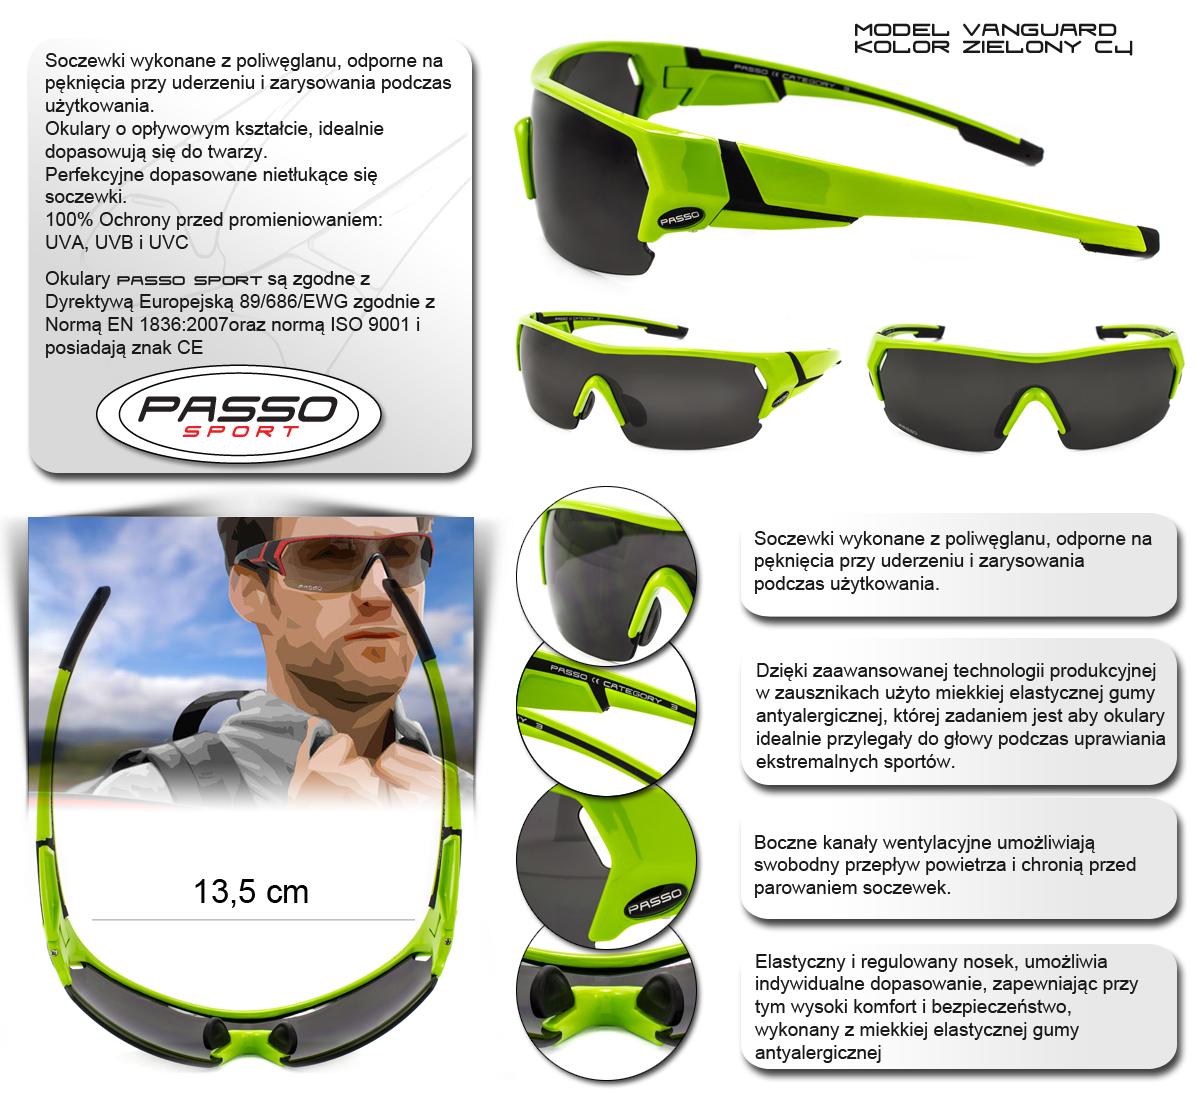 Okulary Sportowe Vanguard